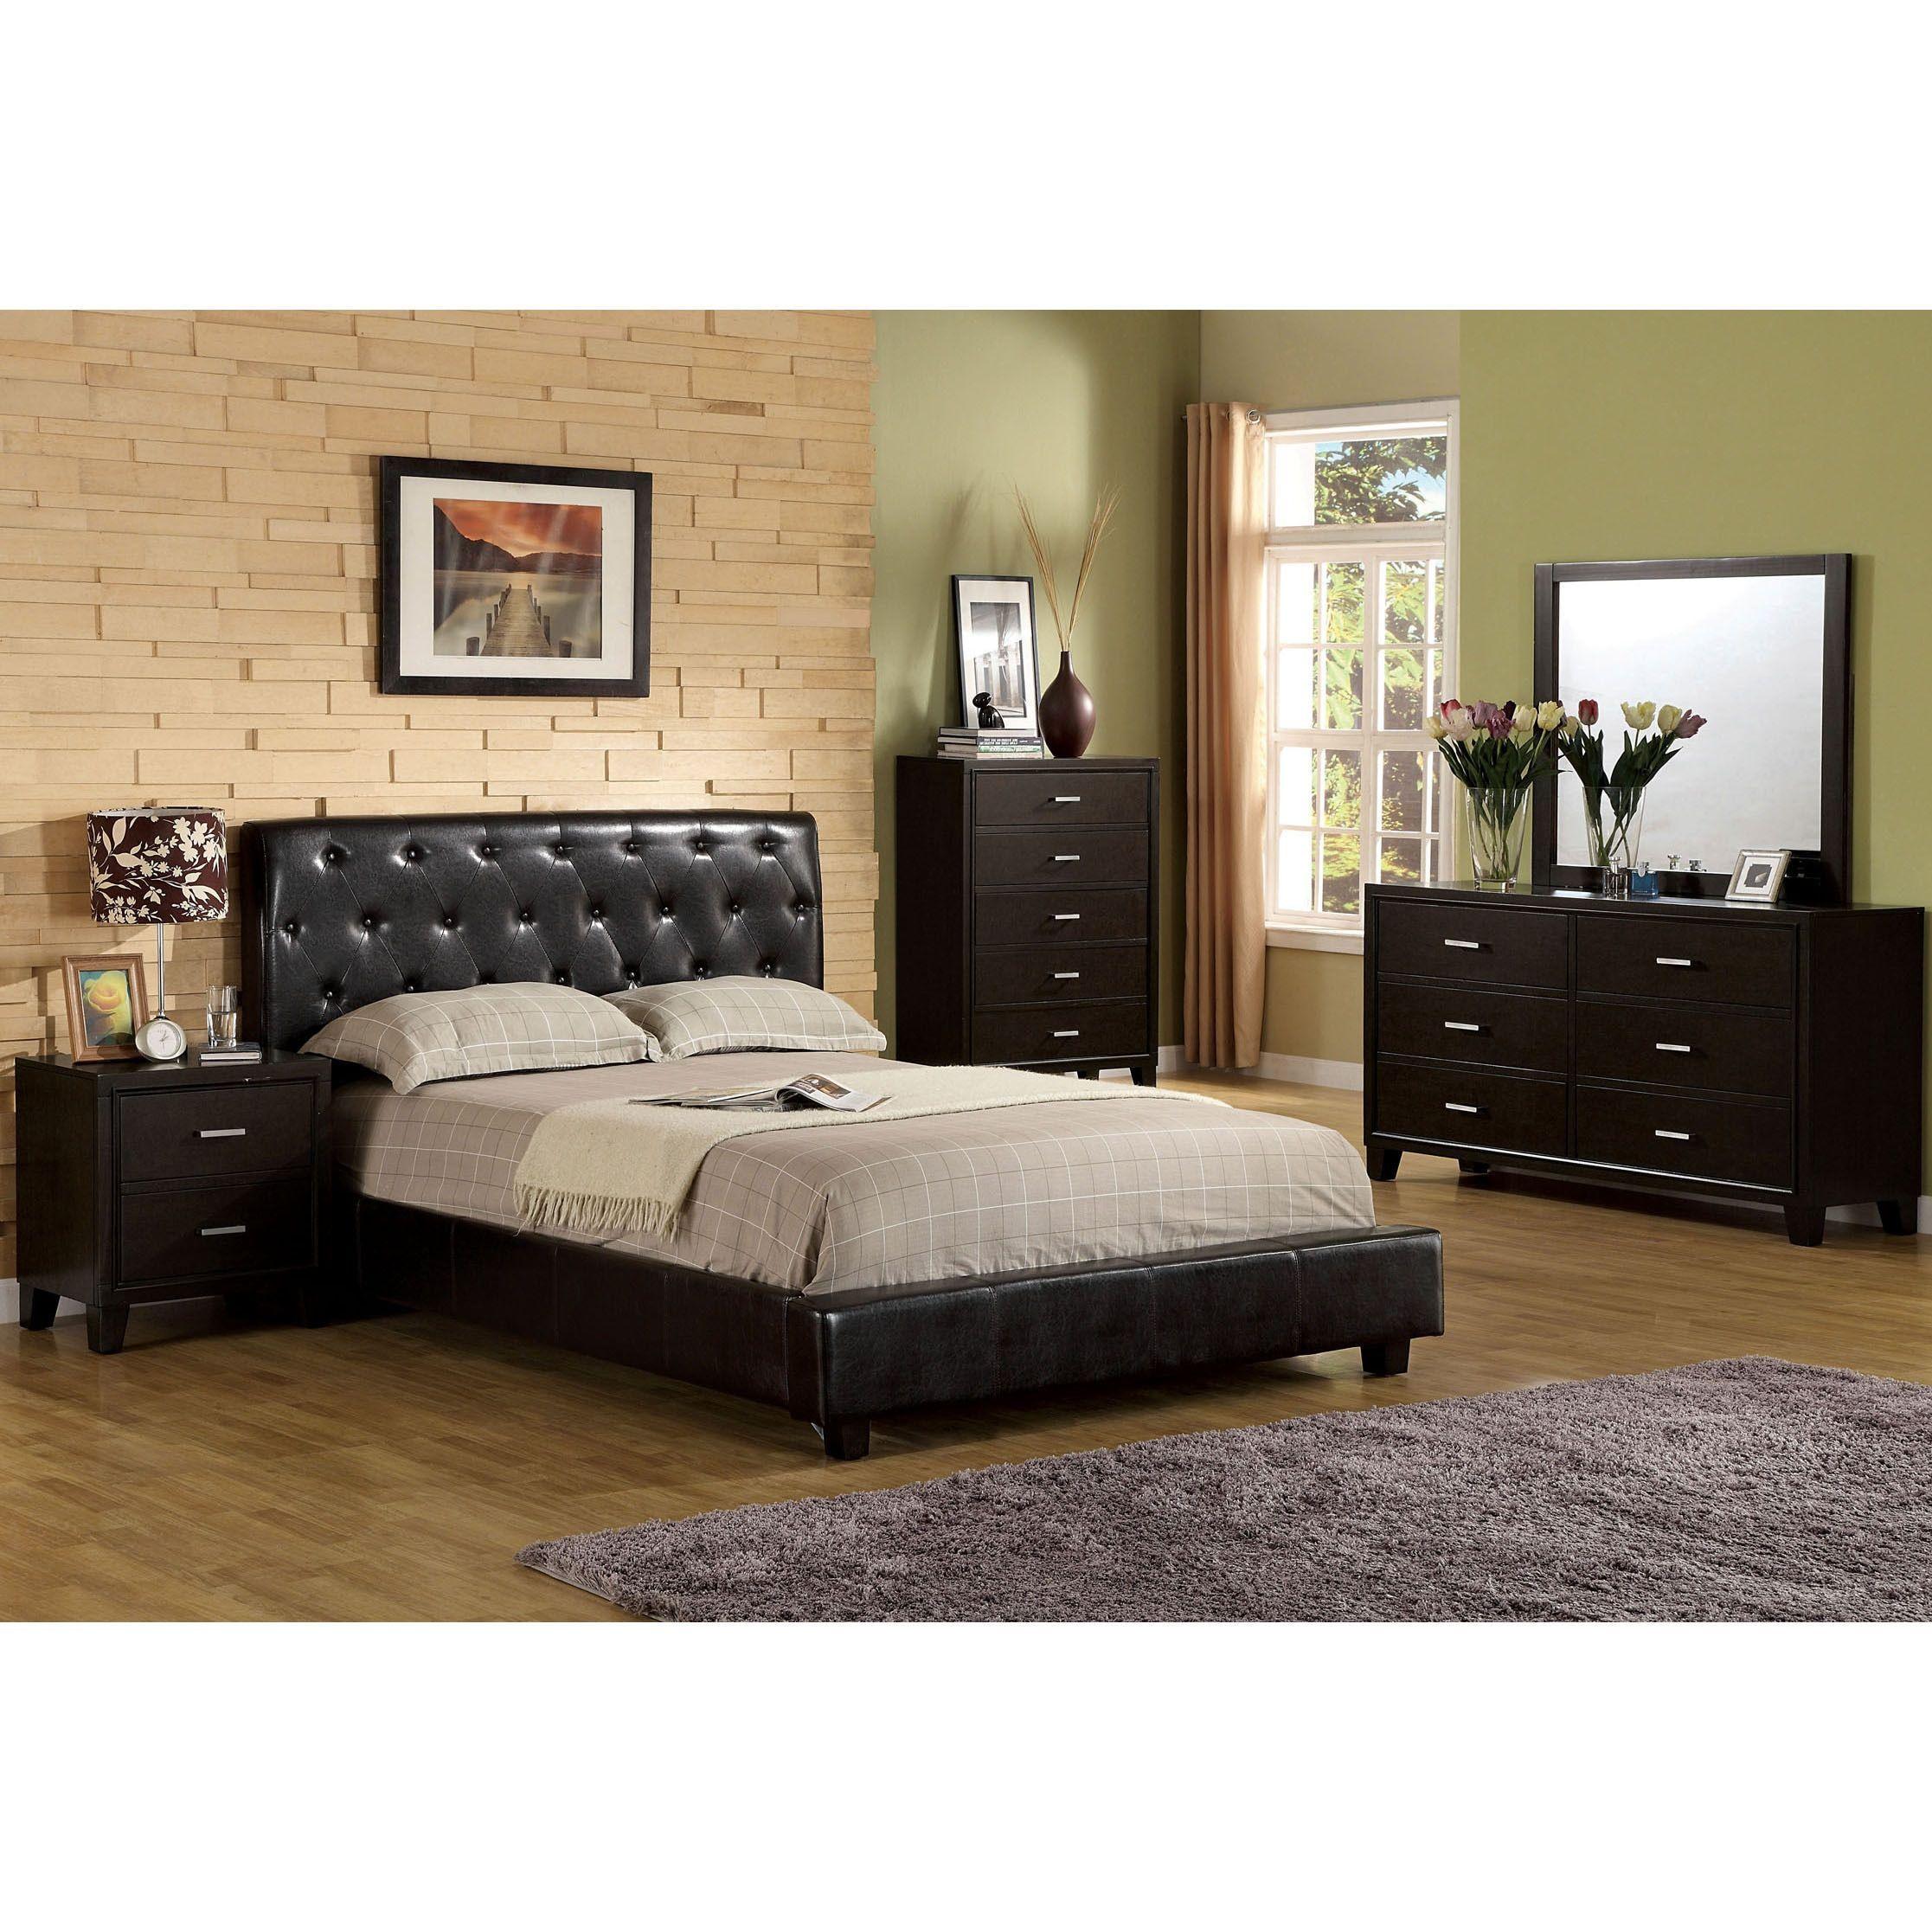 Furniture of america pendezi modern piece espresso bedroom set